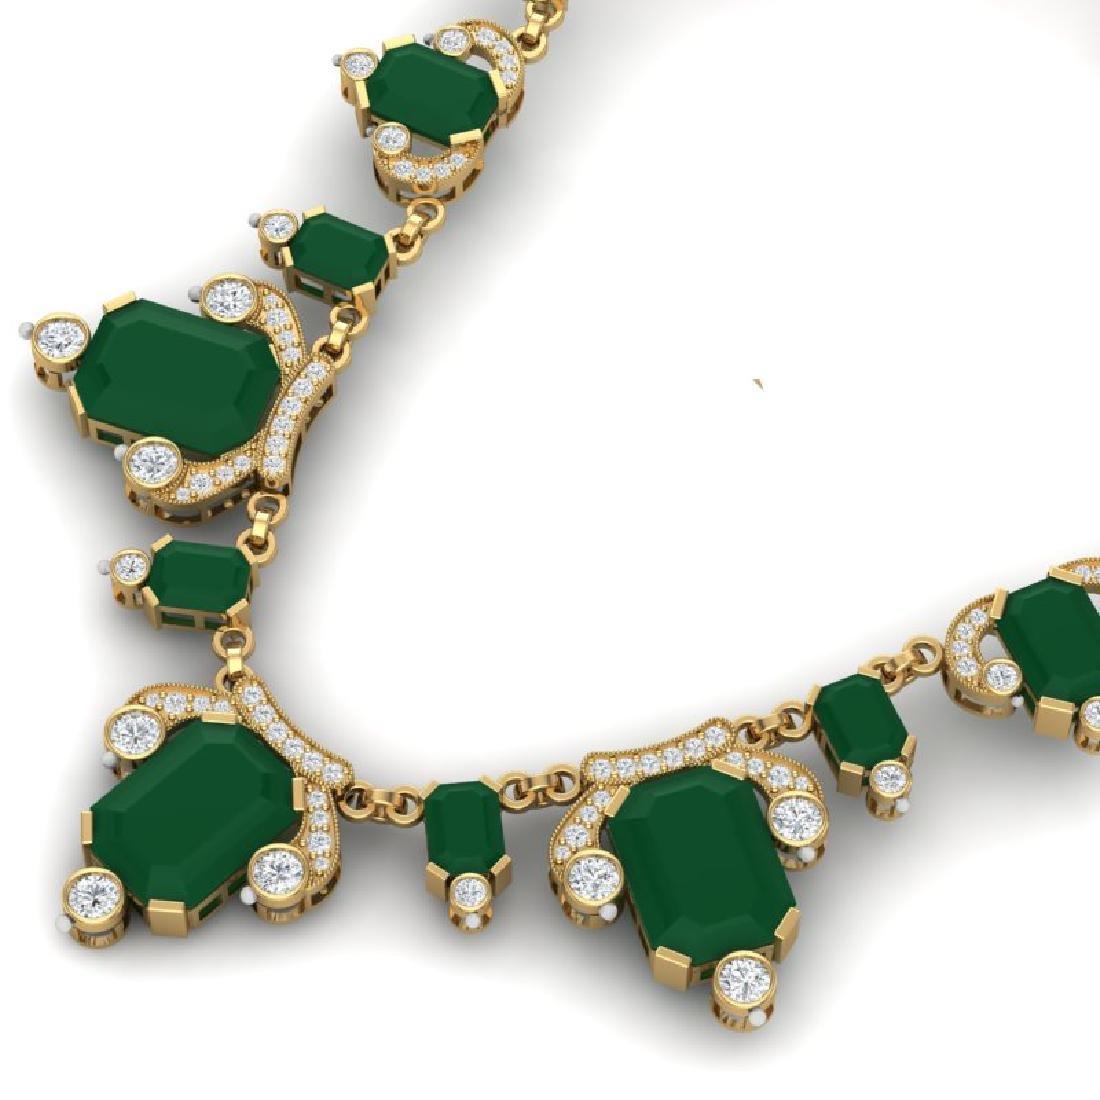 75.21 CTW Royalty Emerald & VS Diamond Necklace 18K - 2